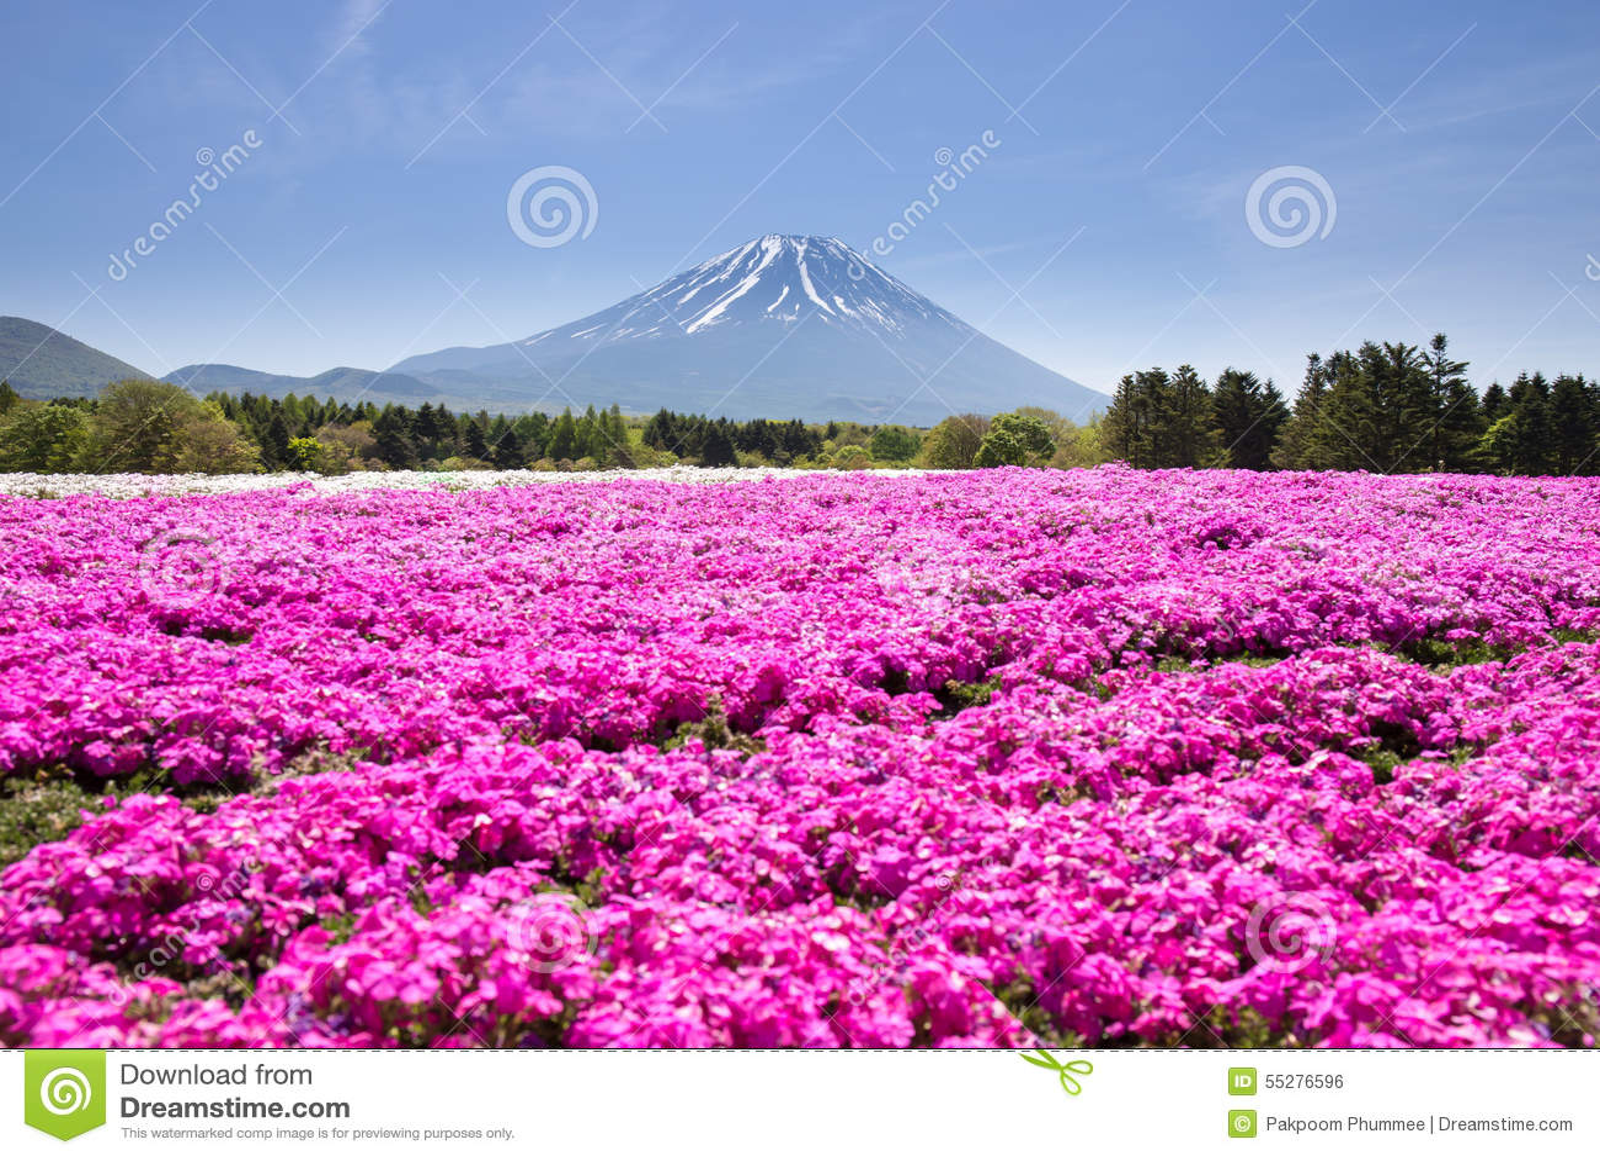 Japan Shibazakura Festival with the field of pink moss of Sakura or cherry blossom with Mountain Fuji Yamanashi, Japan